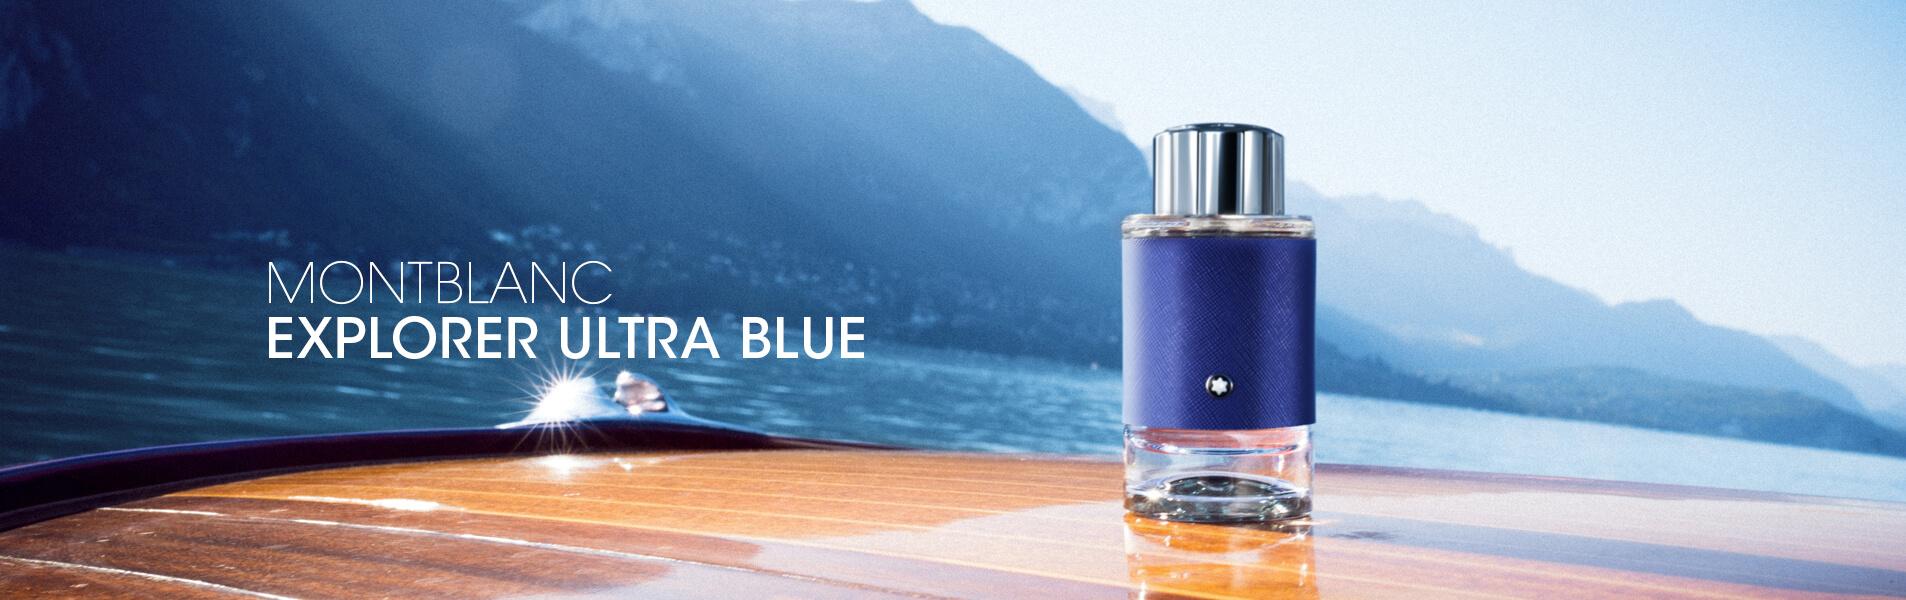 Montblanc Explorer Ultra blue